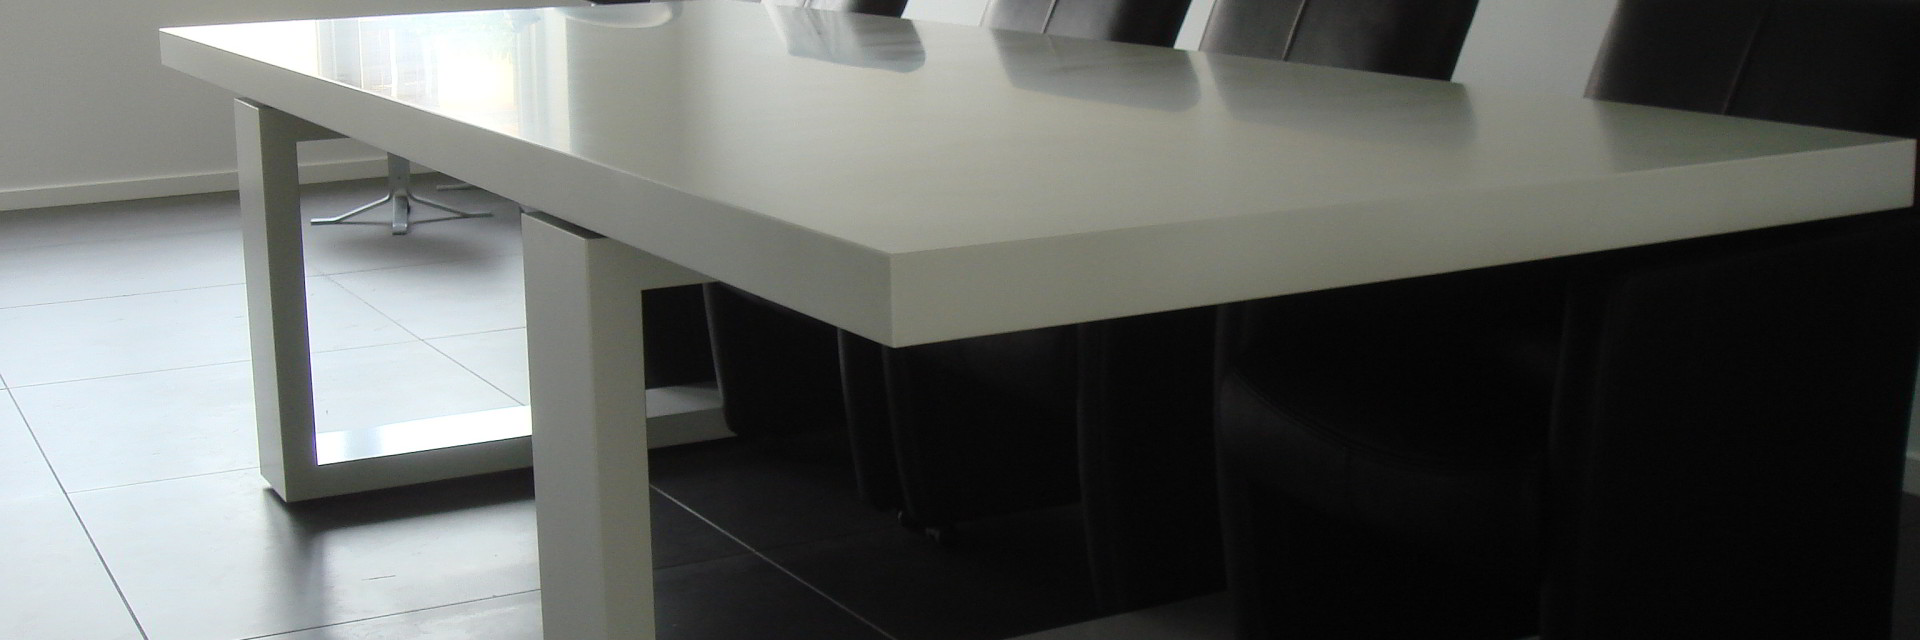 Kæmpe stuebord